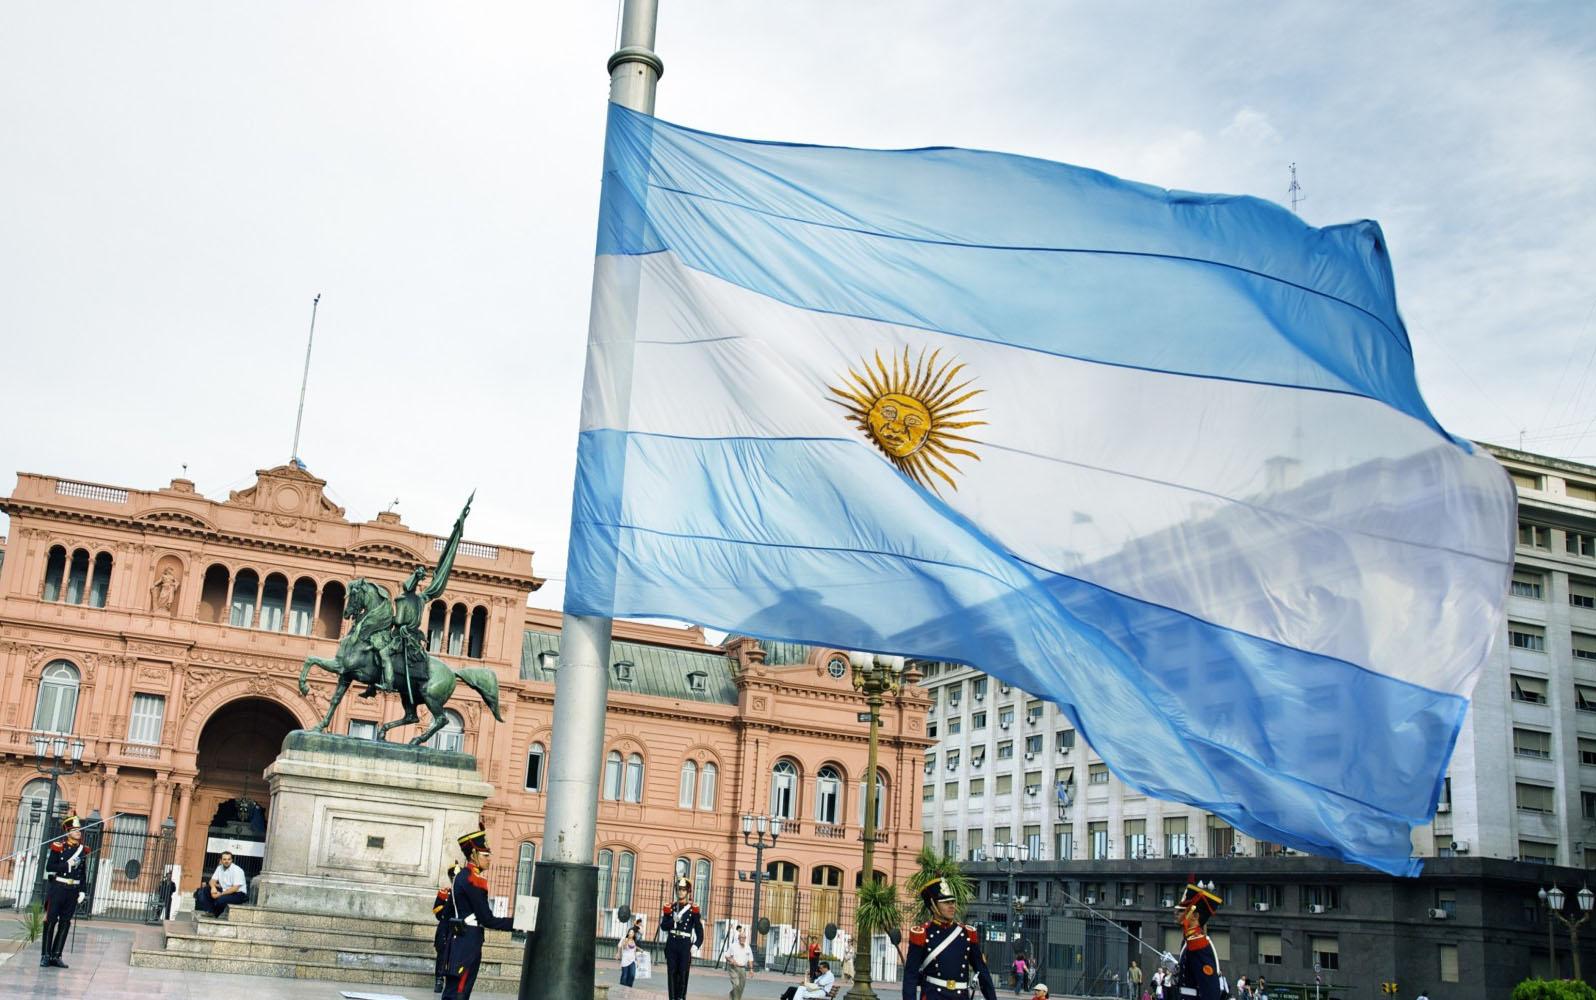 The Argentina flag, Casa Rosada, Plaza de Mayo, Buenos Aires, Argentina.